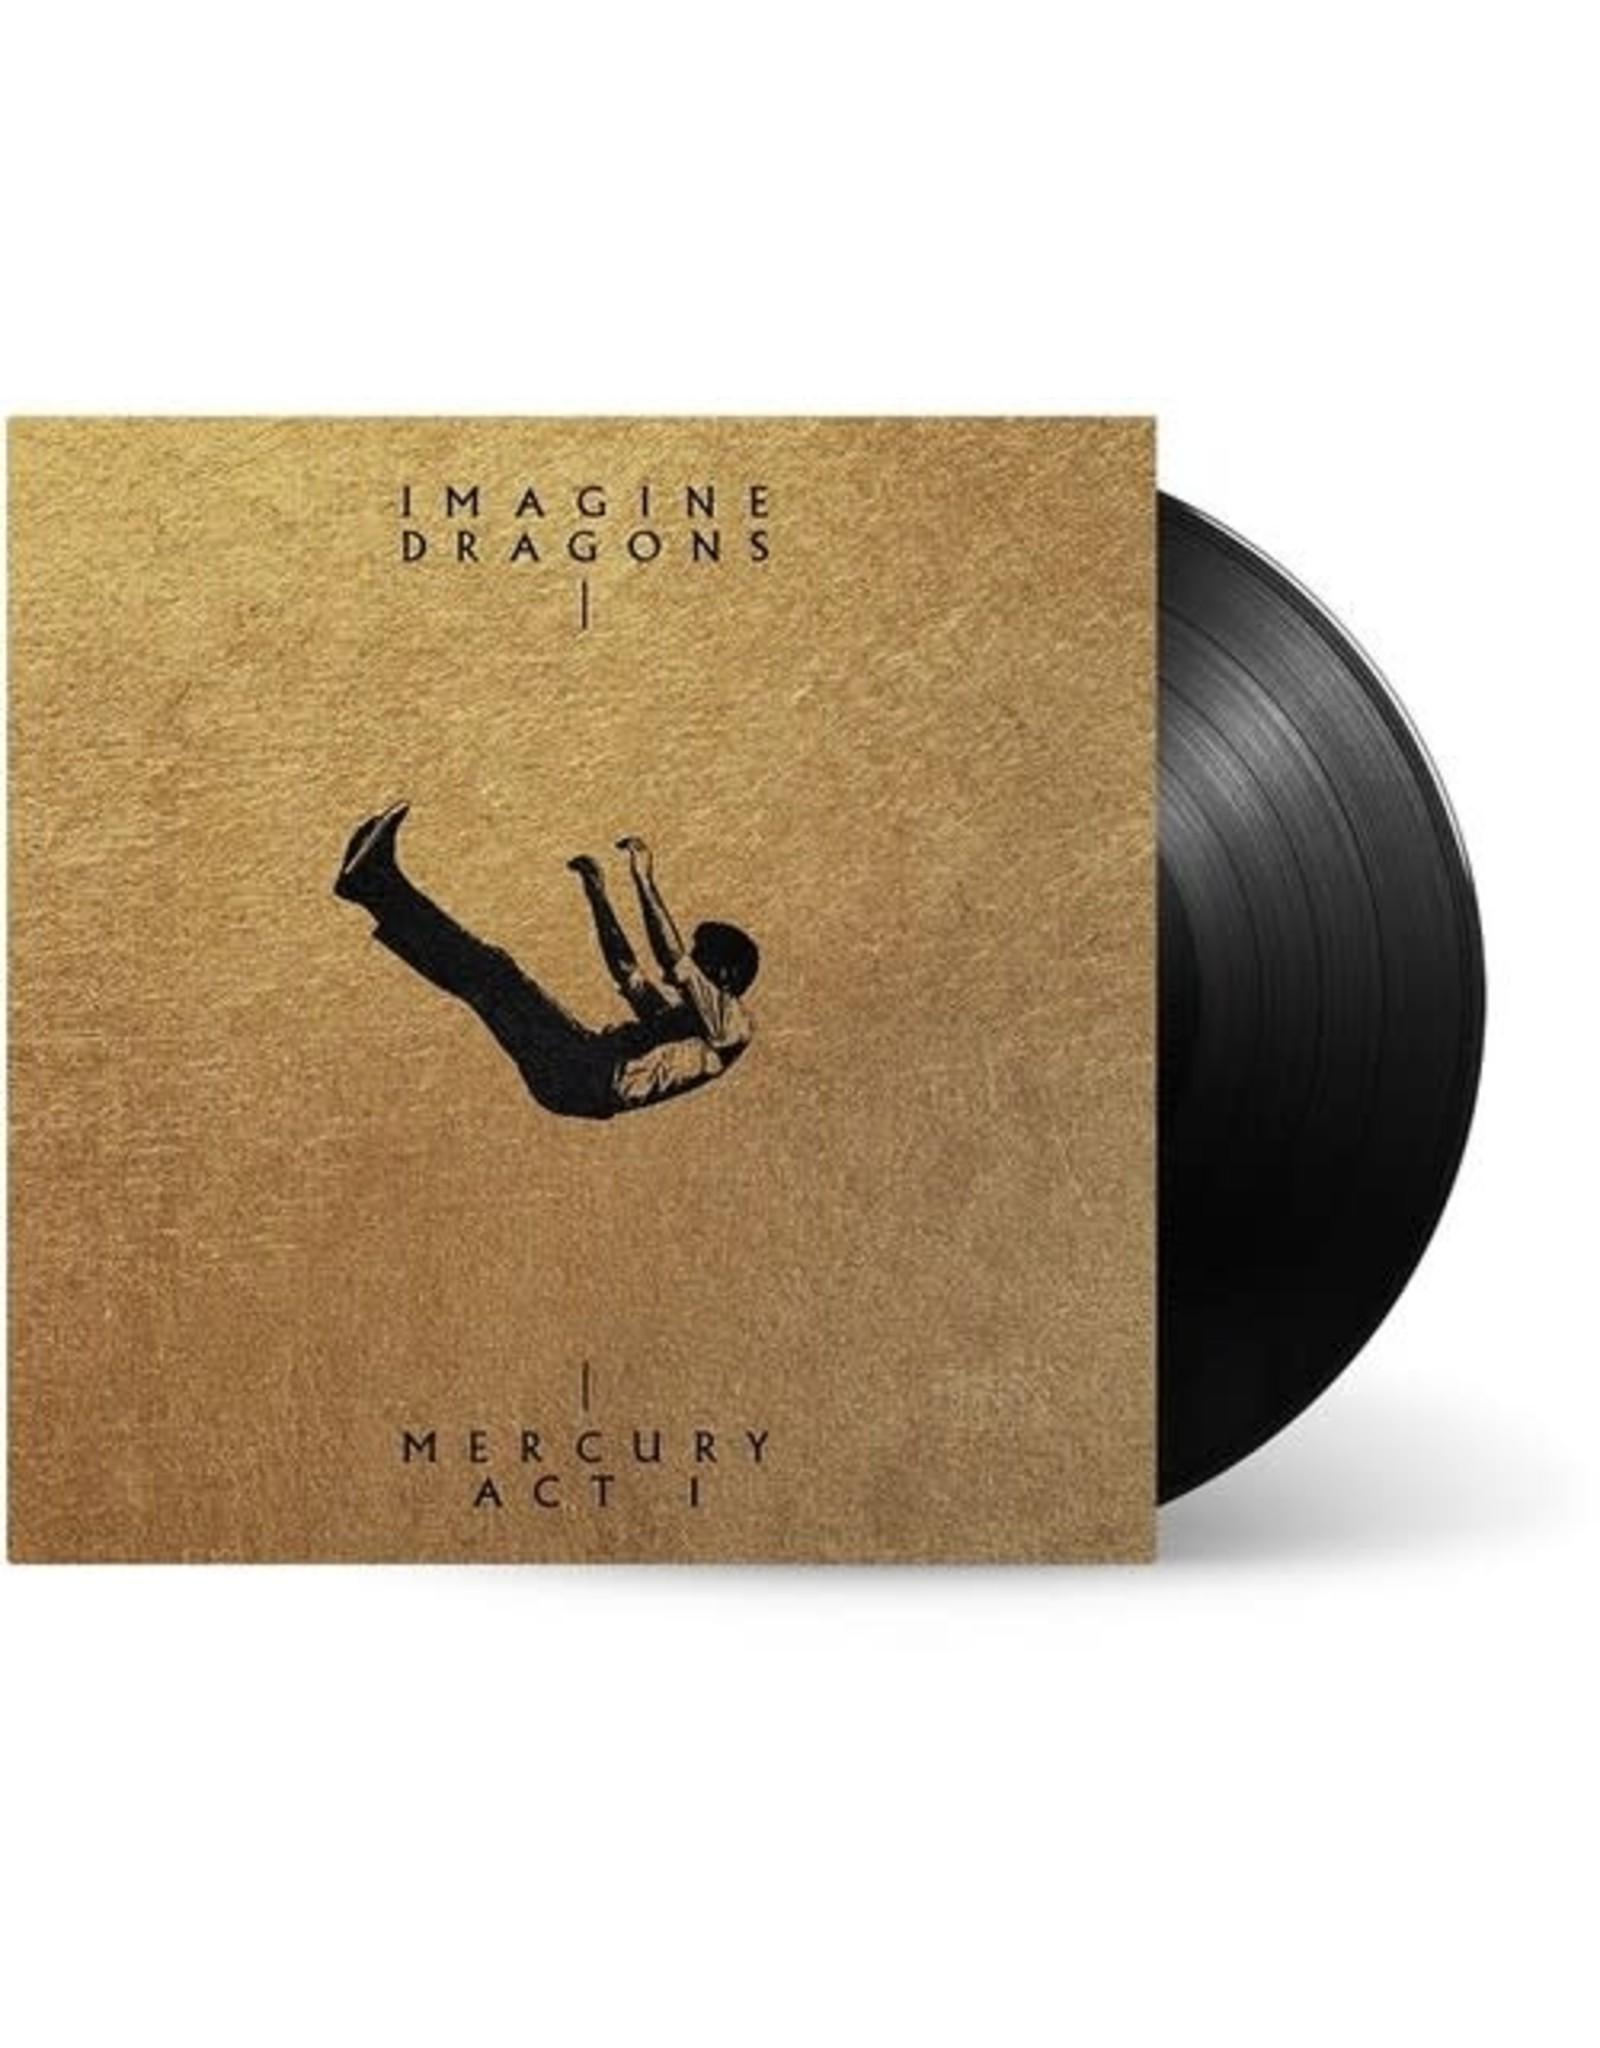 New Vinyl Imagine Dragons - Mercury: Act 1 LP